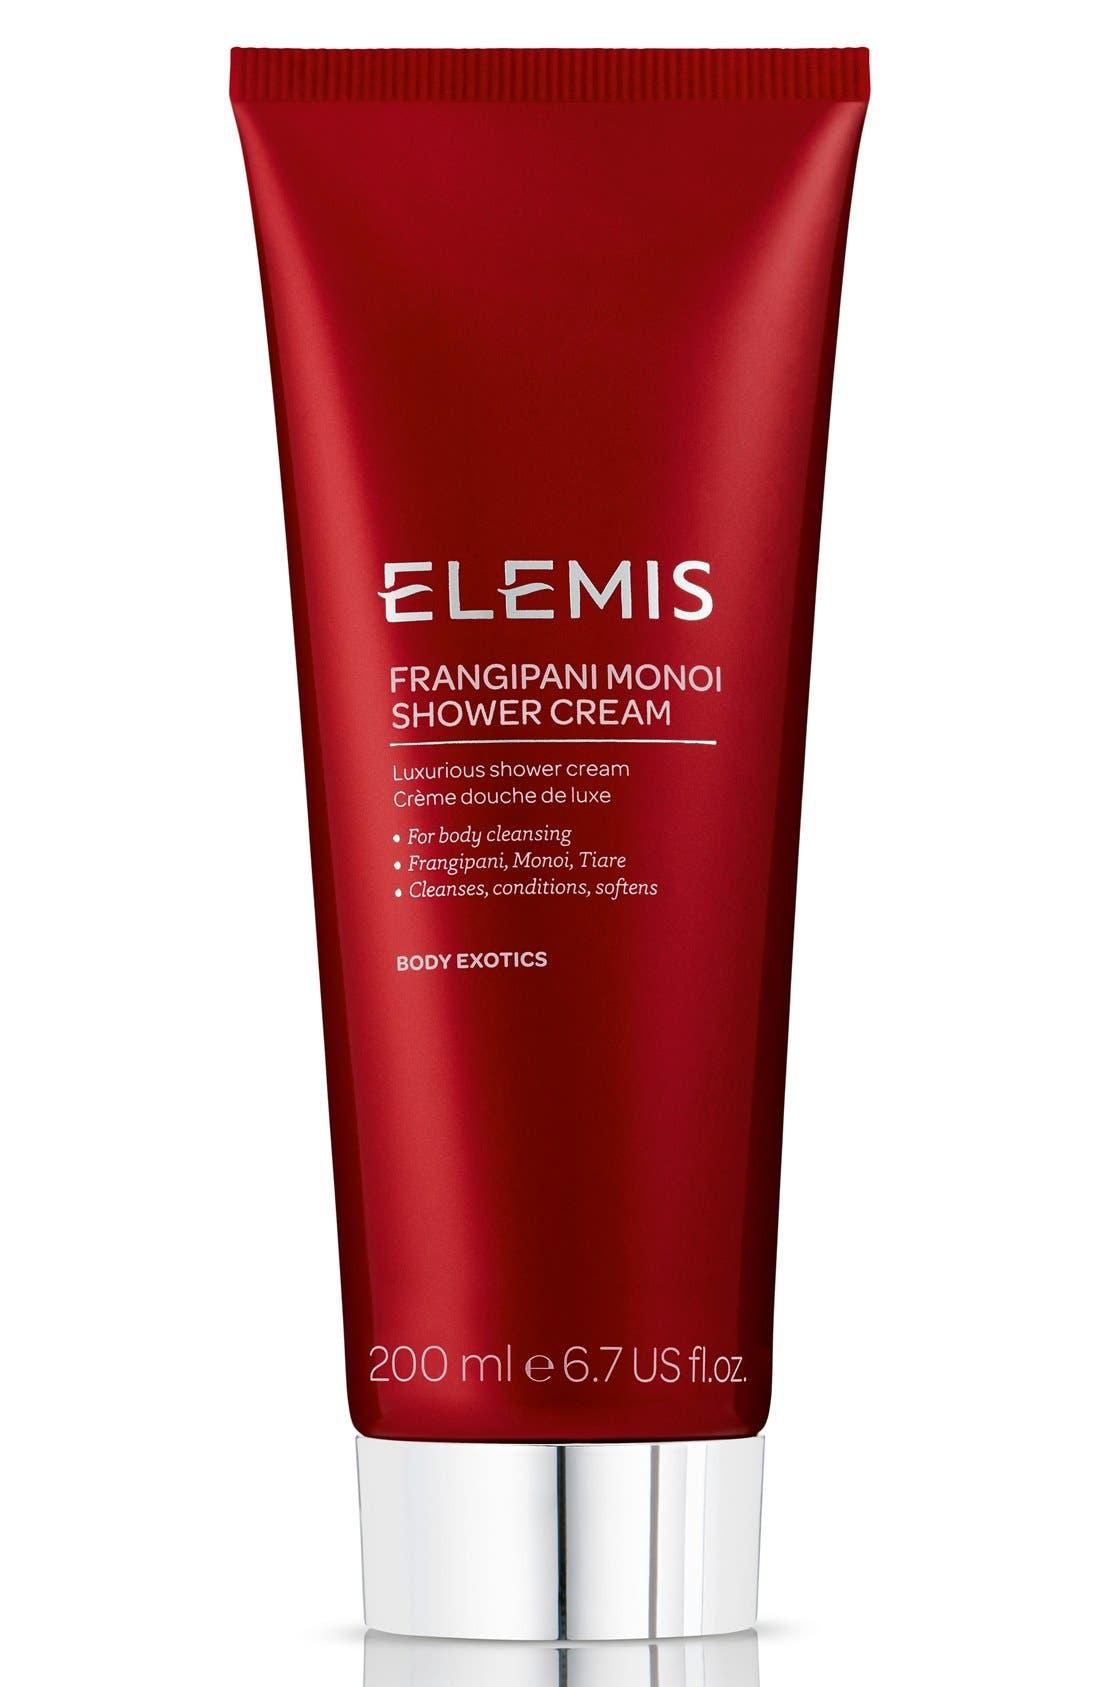 Elemis Frangipani Monoi Shower Cream